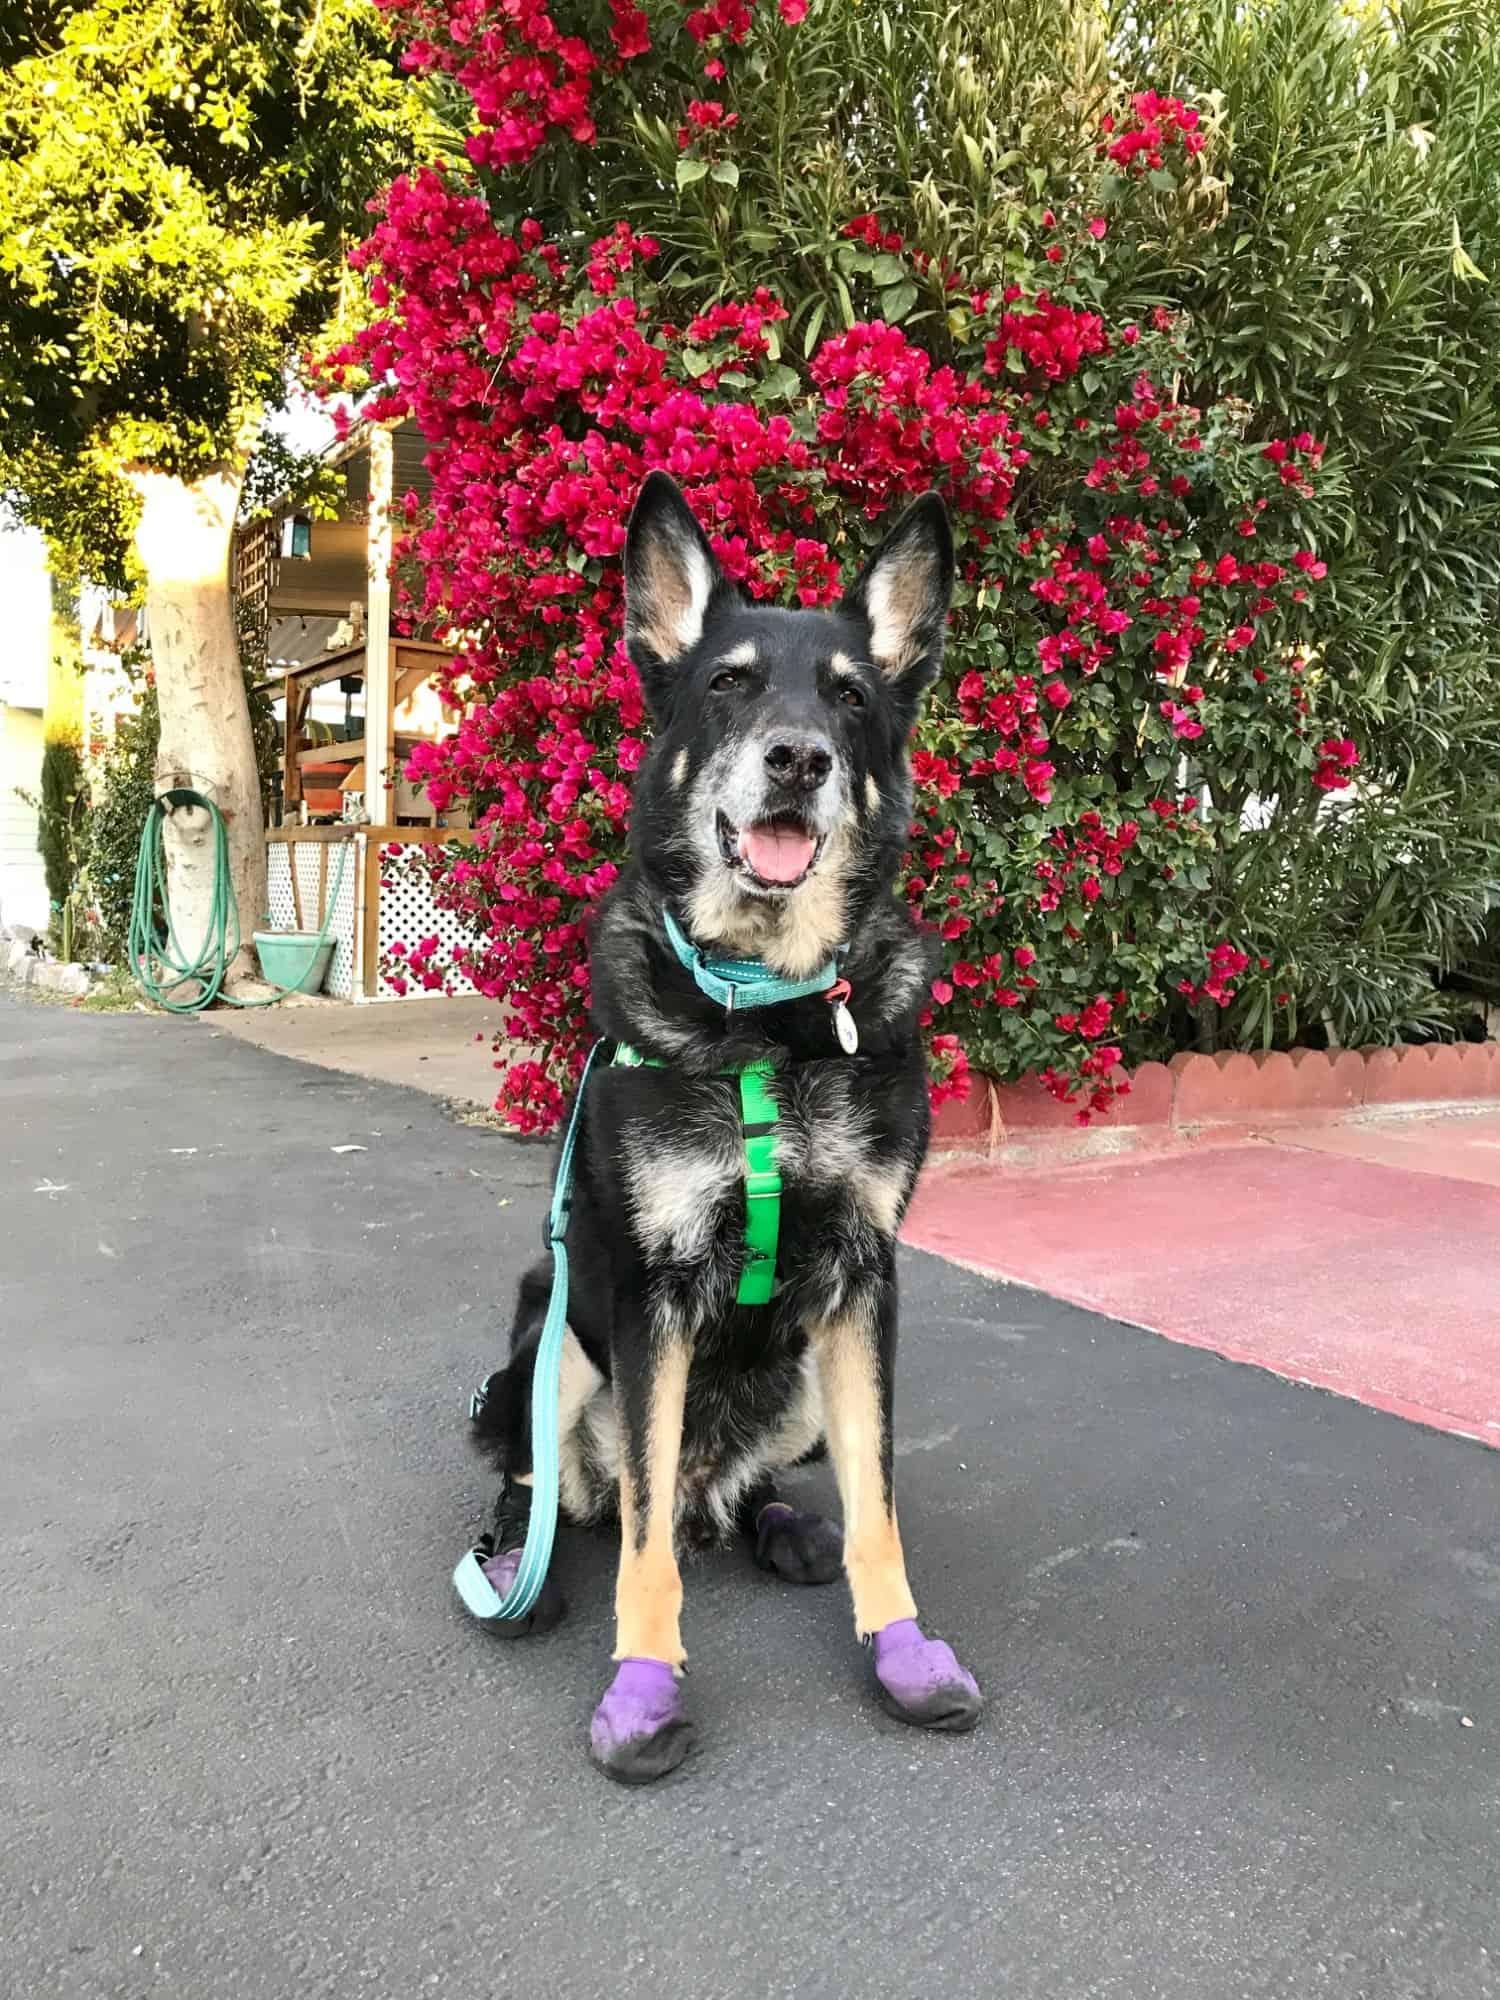 Buster the German Shepherd Dog walking in purple dog boots